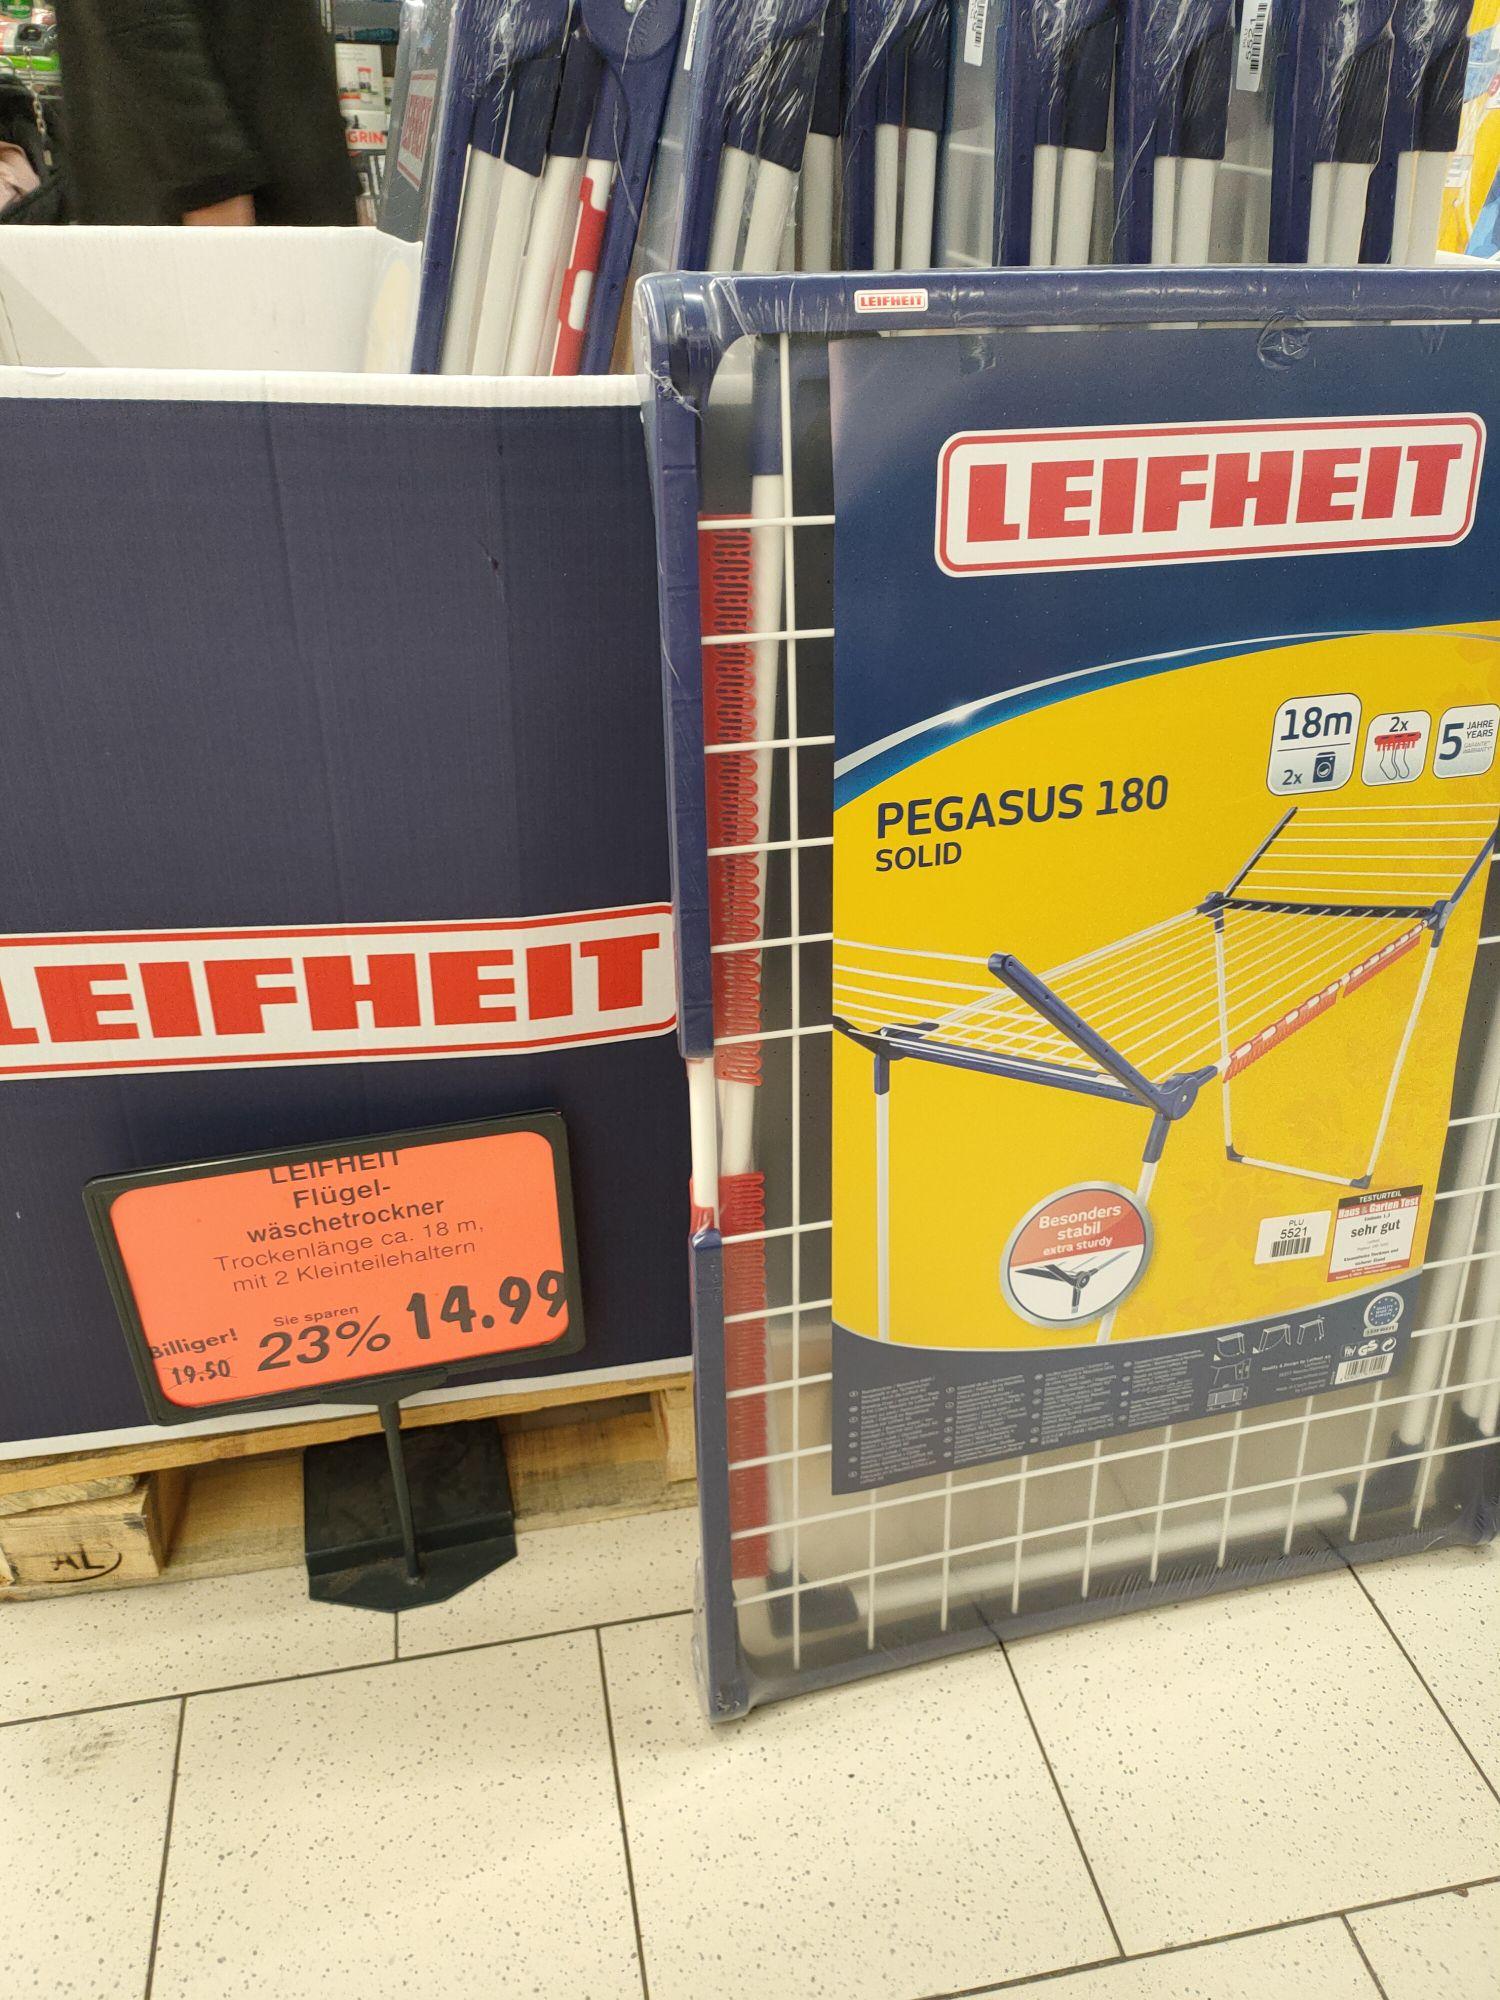 Leifheit Pegasus 180 Solid (lokal Berlin?)